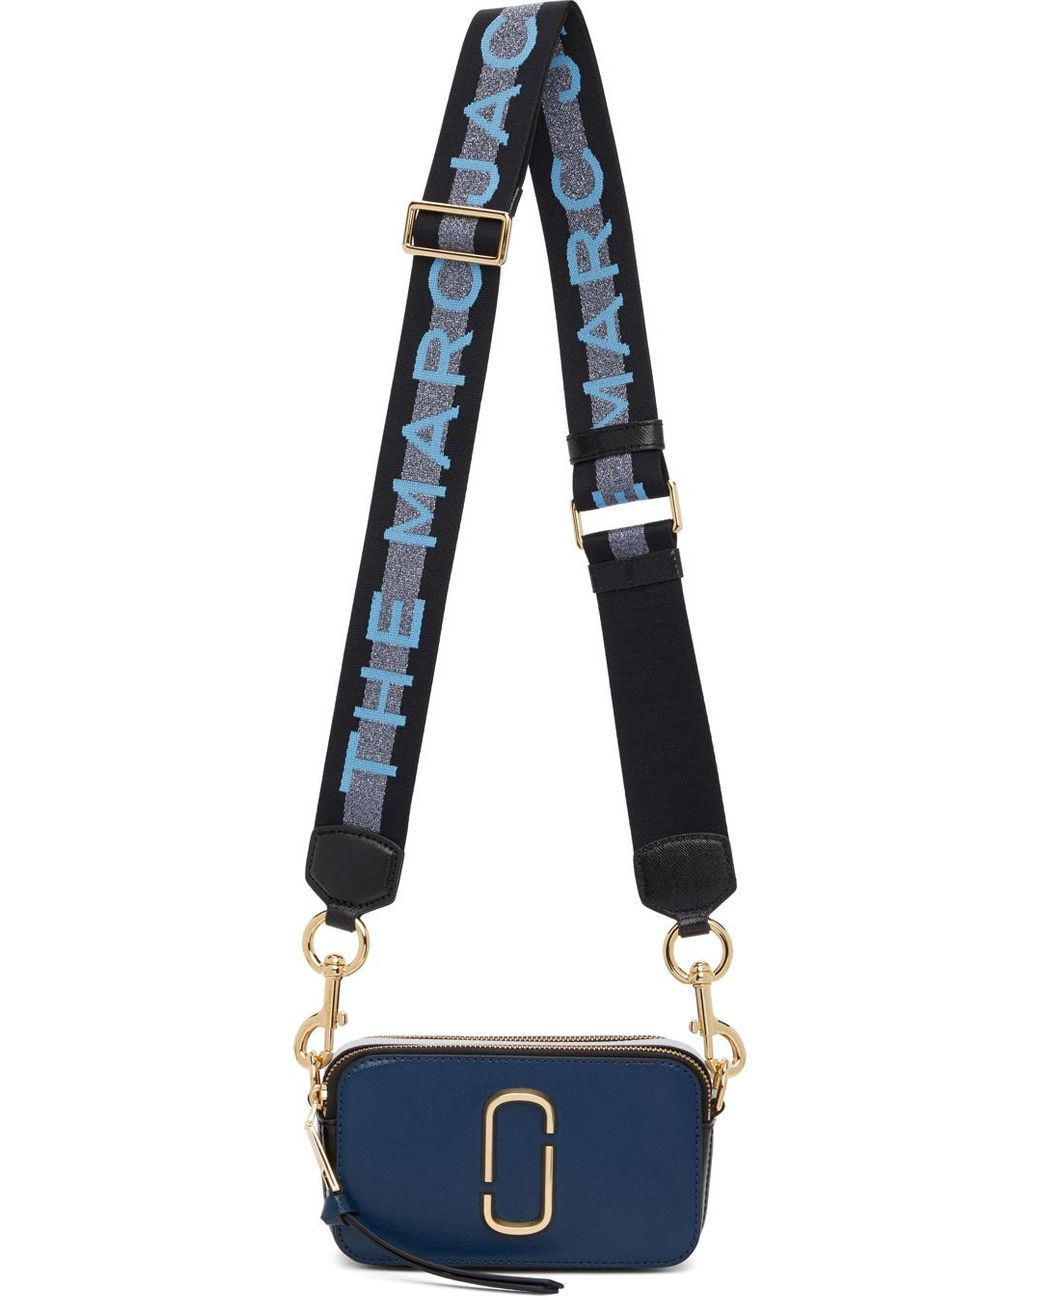 Sac bleu marine 'The Logo Strap Snapshot' Cuir Marc Jacobs en ...